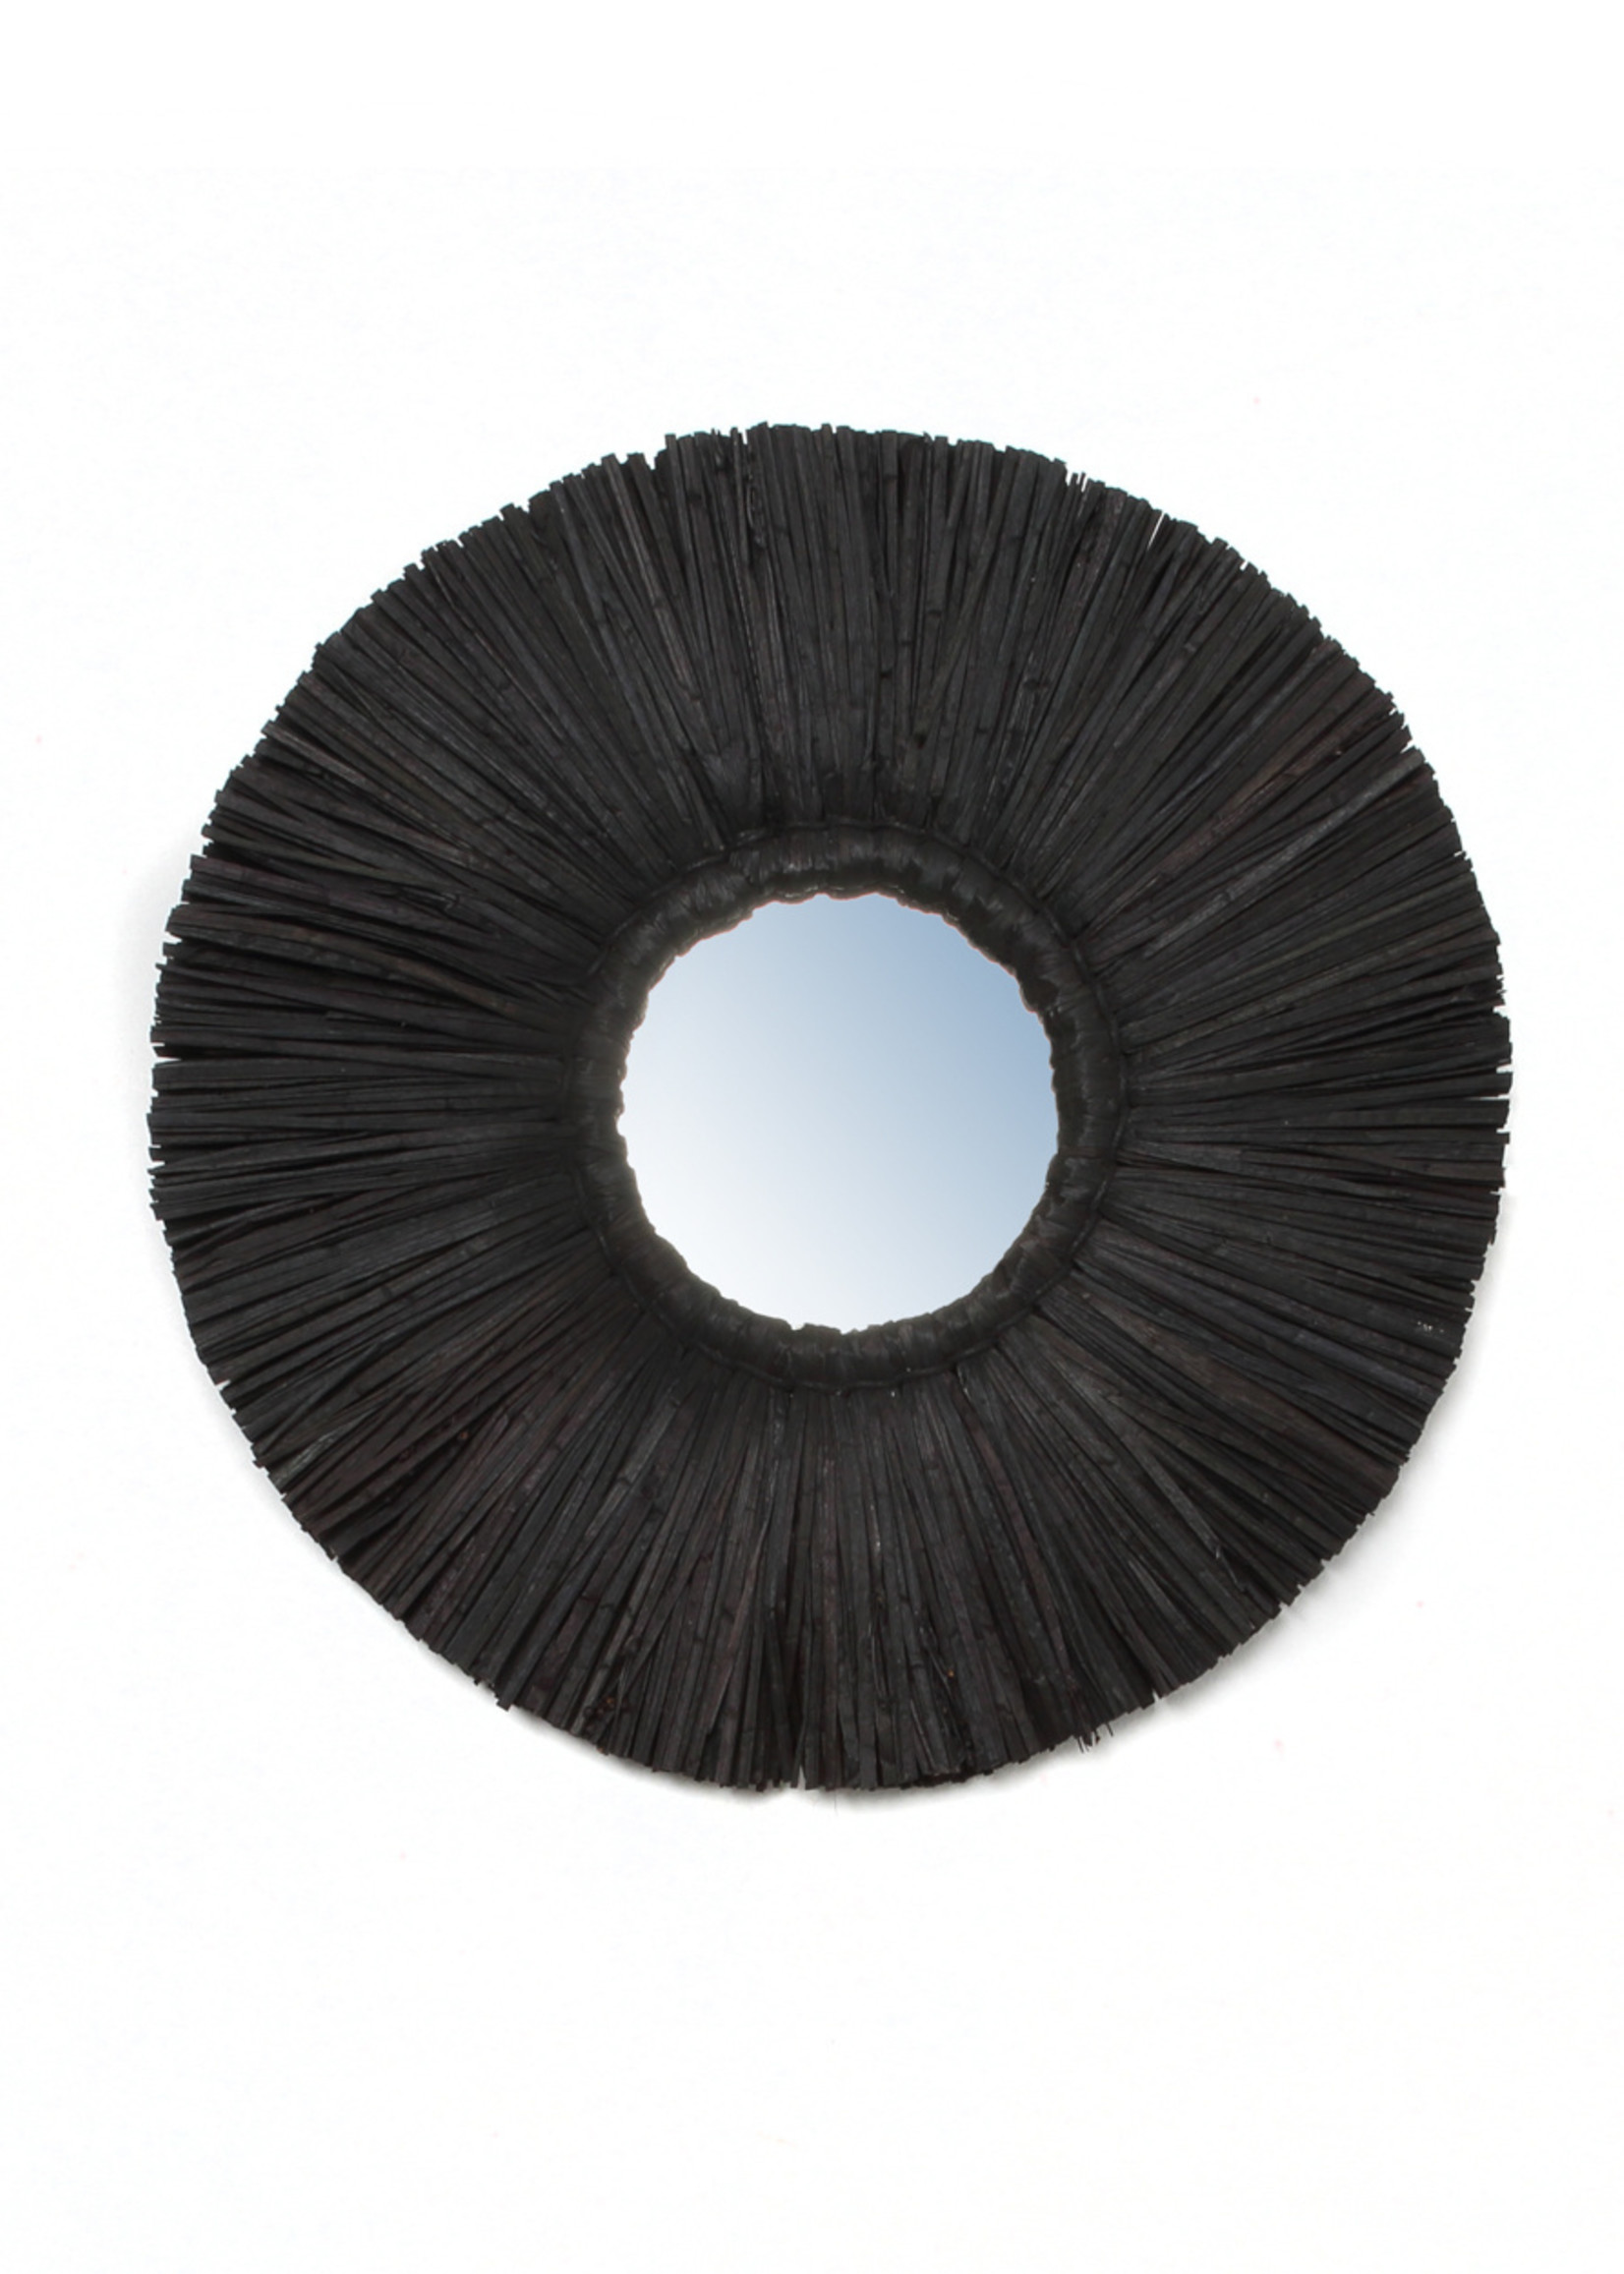 The Alang Alang Mirror - Black - S